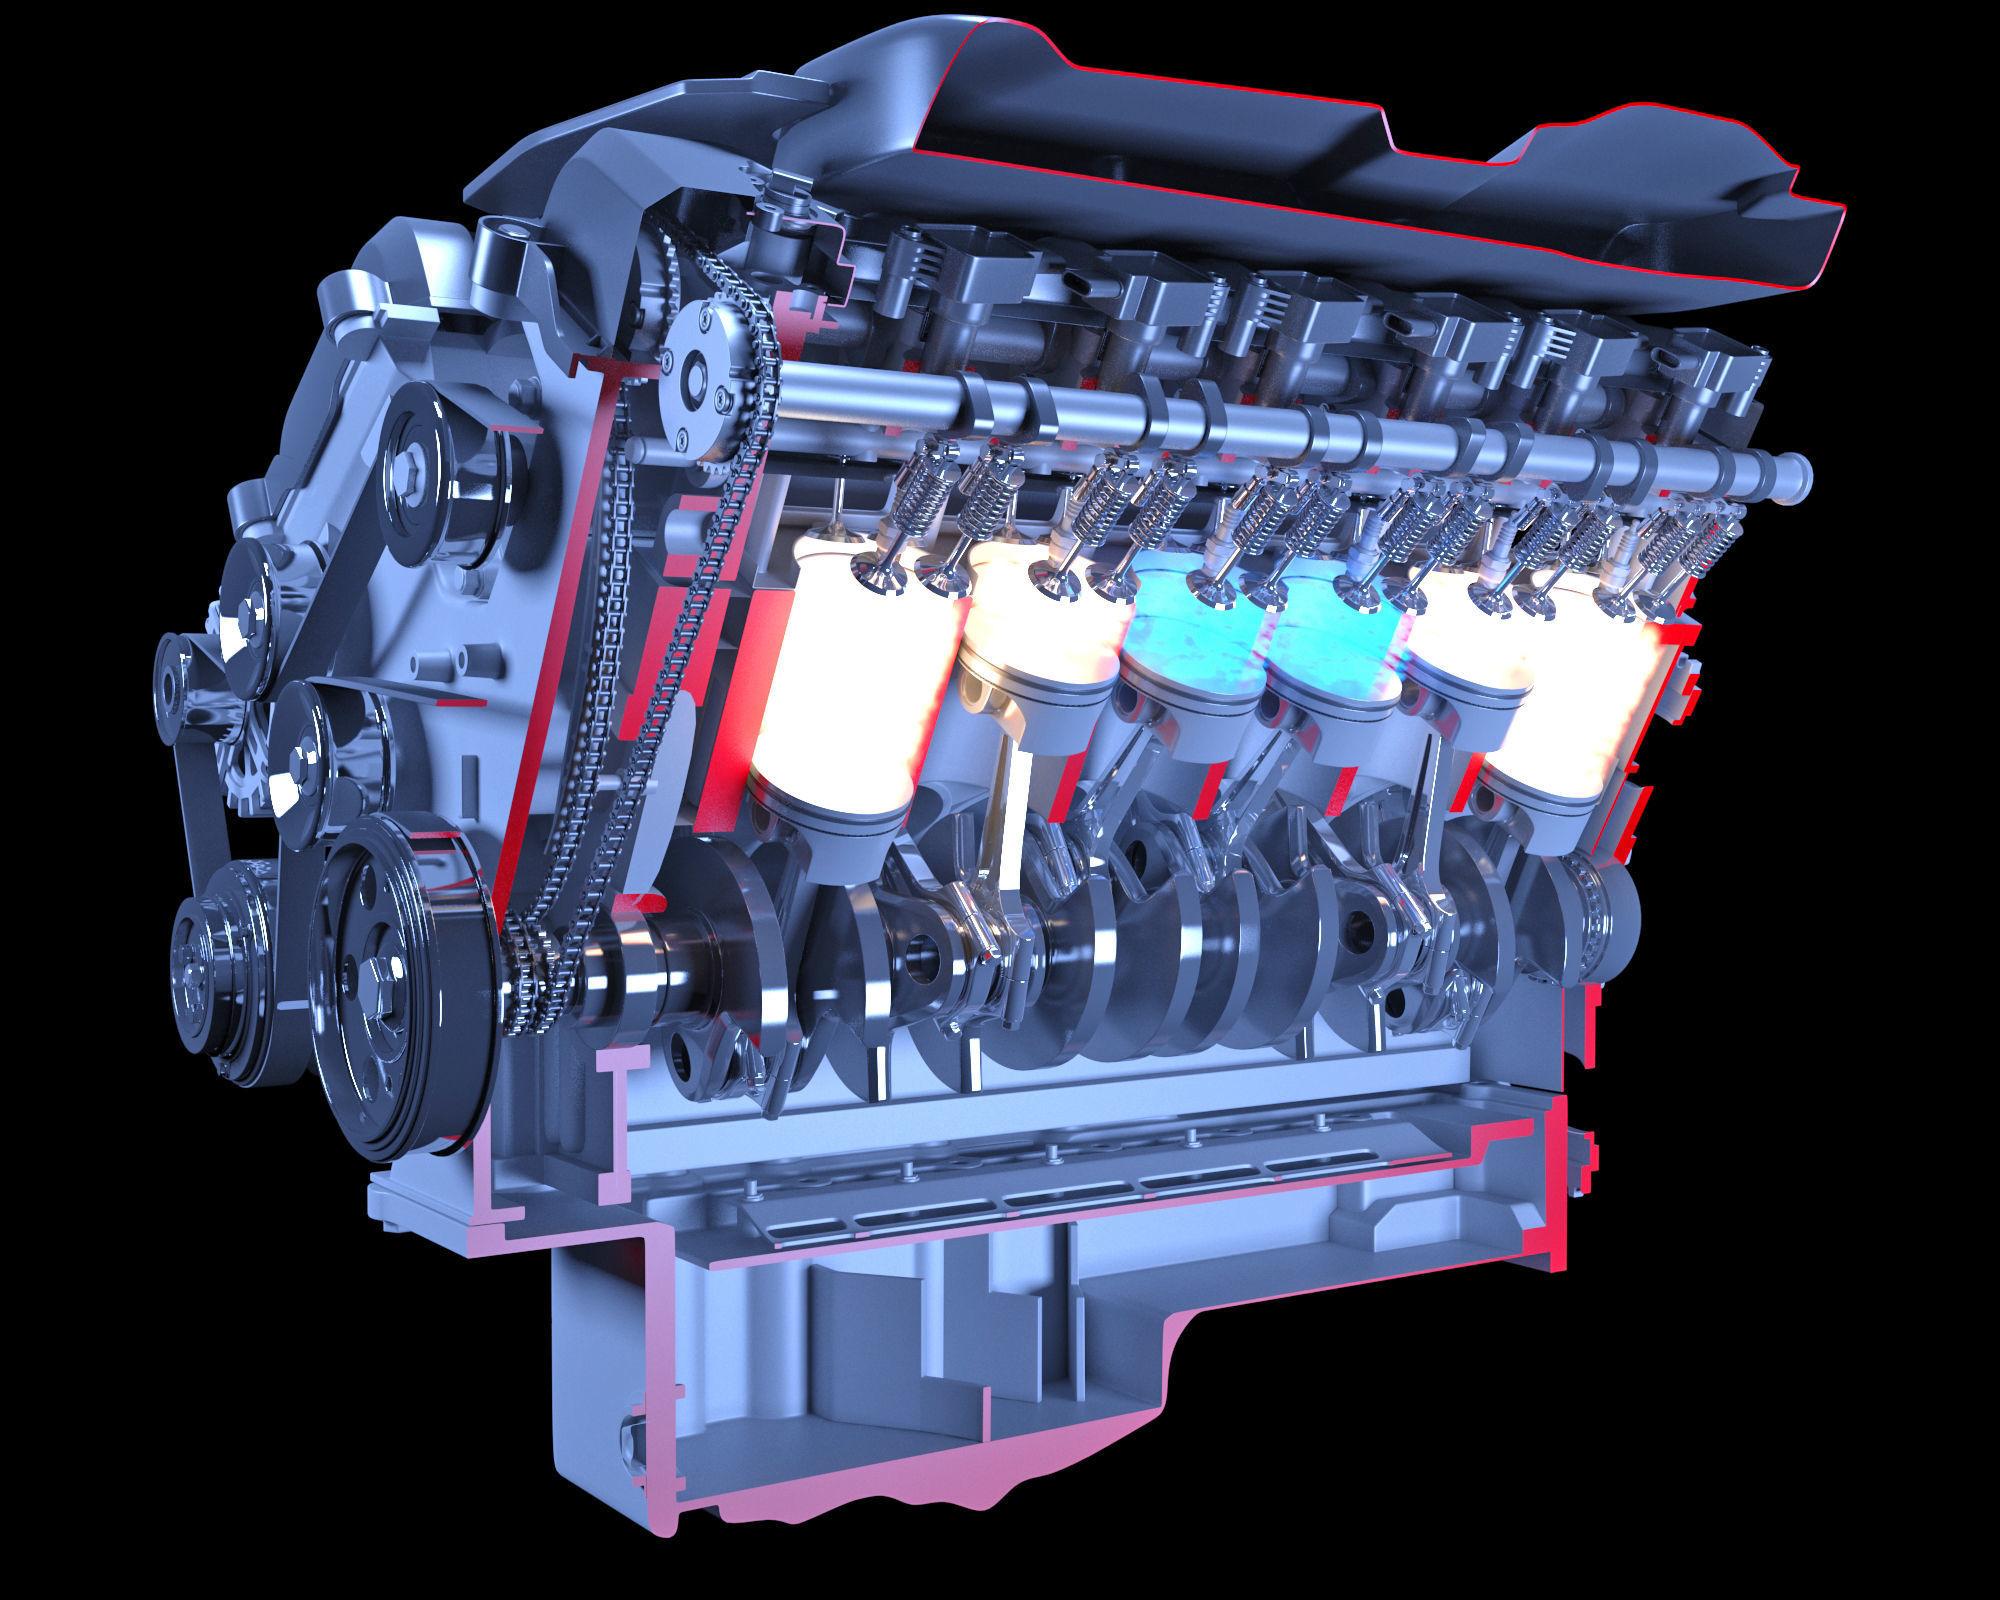 V12 Engine Sectioned Animation Ignition